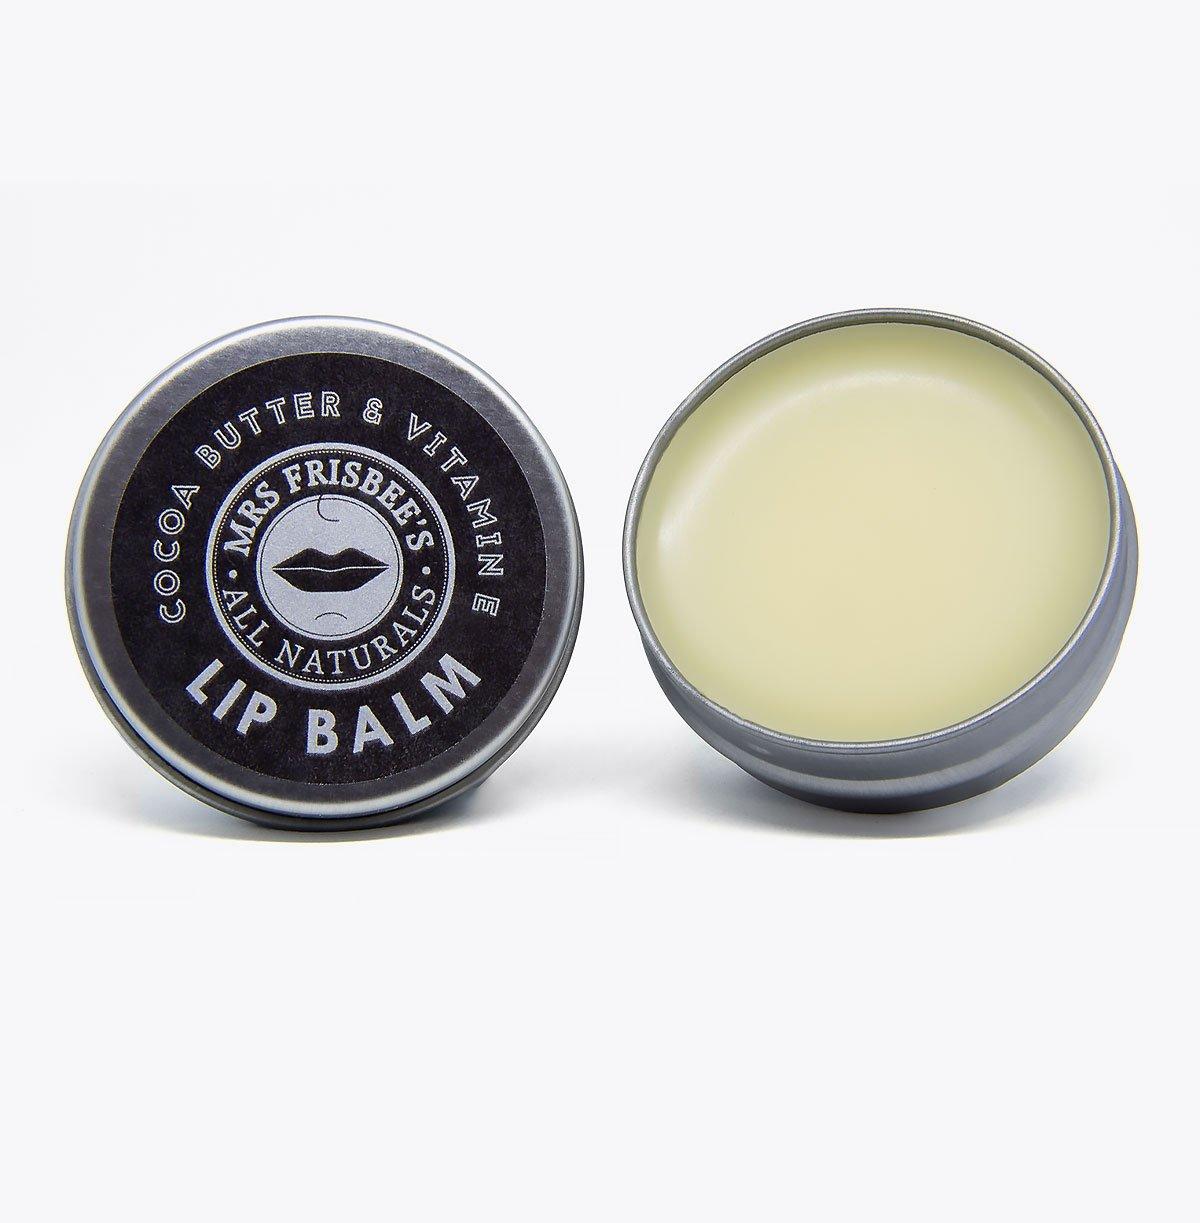 Vegan-friendly cocoa butter lip balm in tin, 15g.